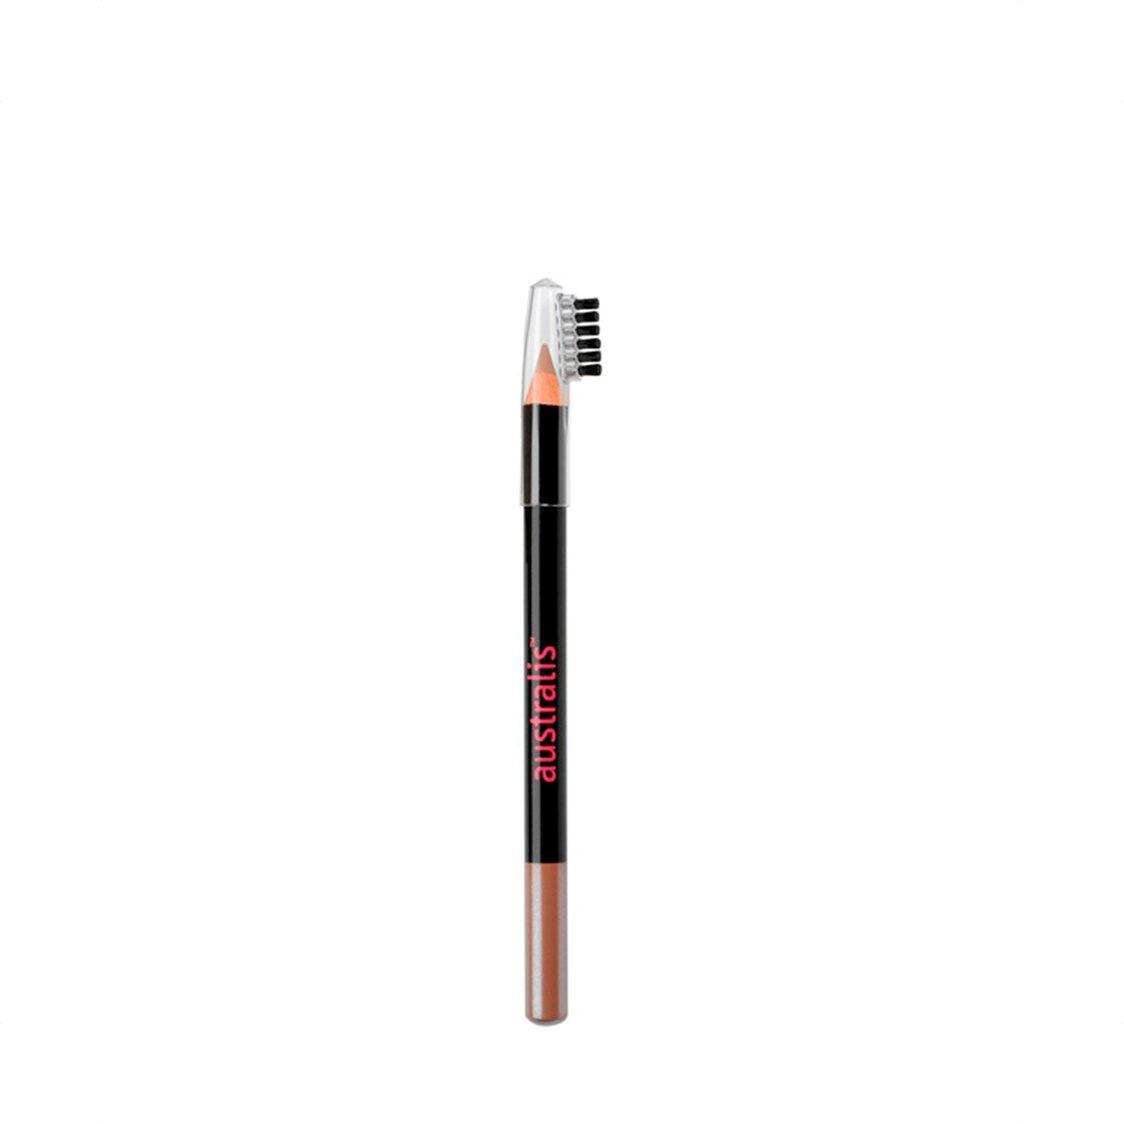 Australis Eyebrow Pencil - Light Brown